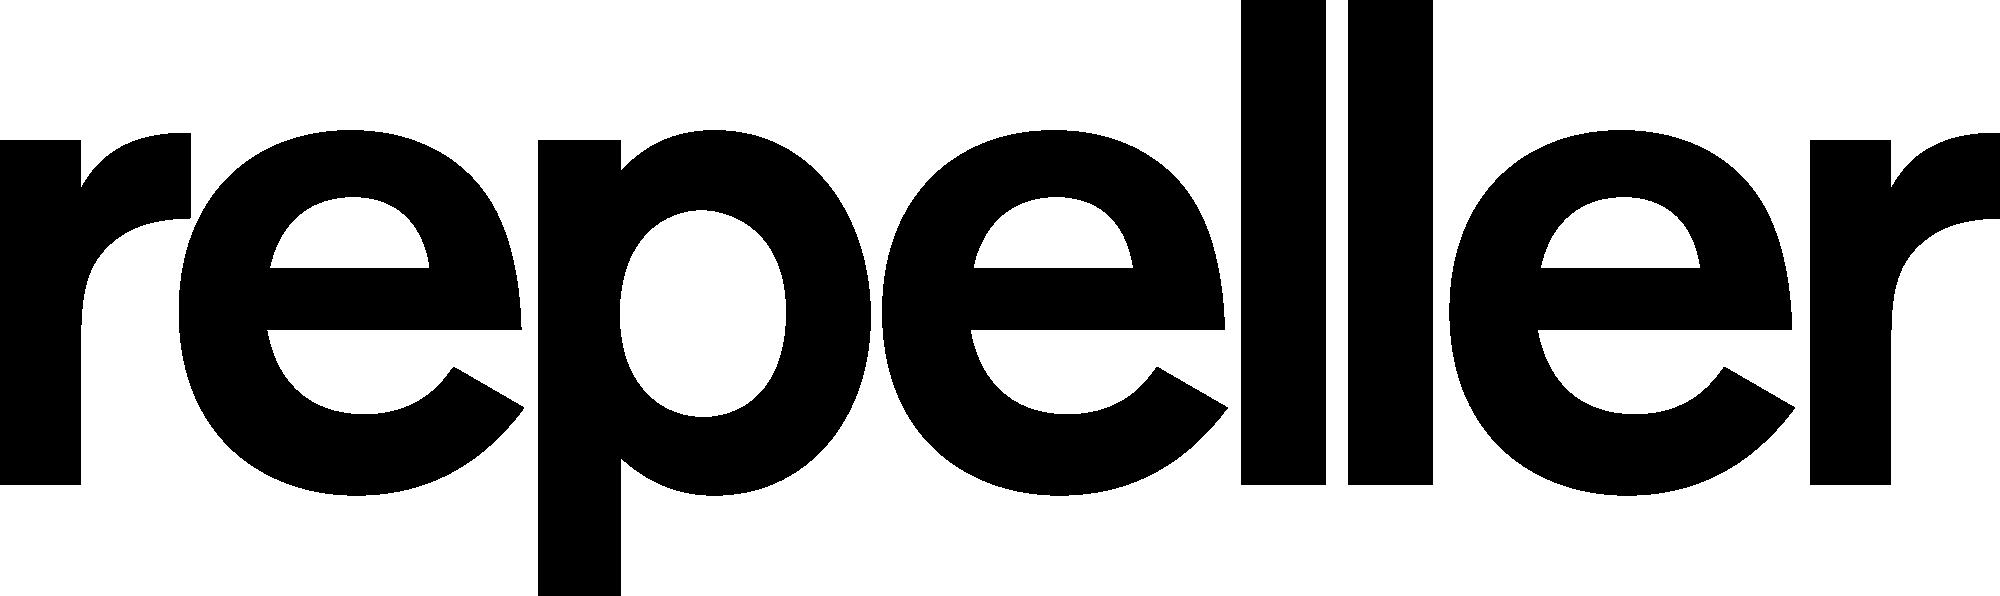 Repeller logo